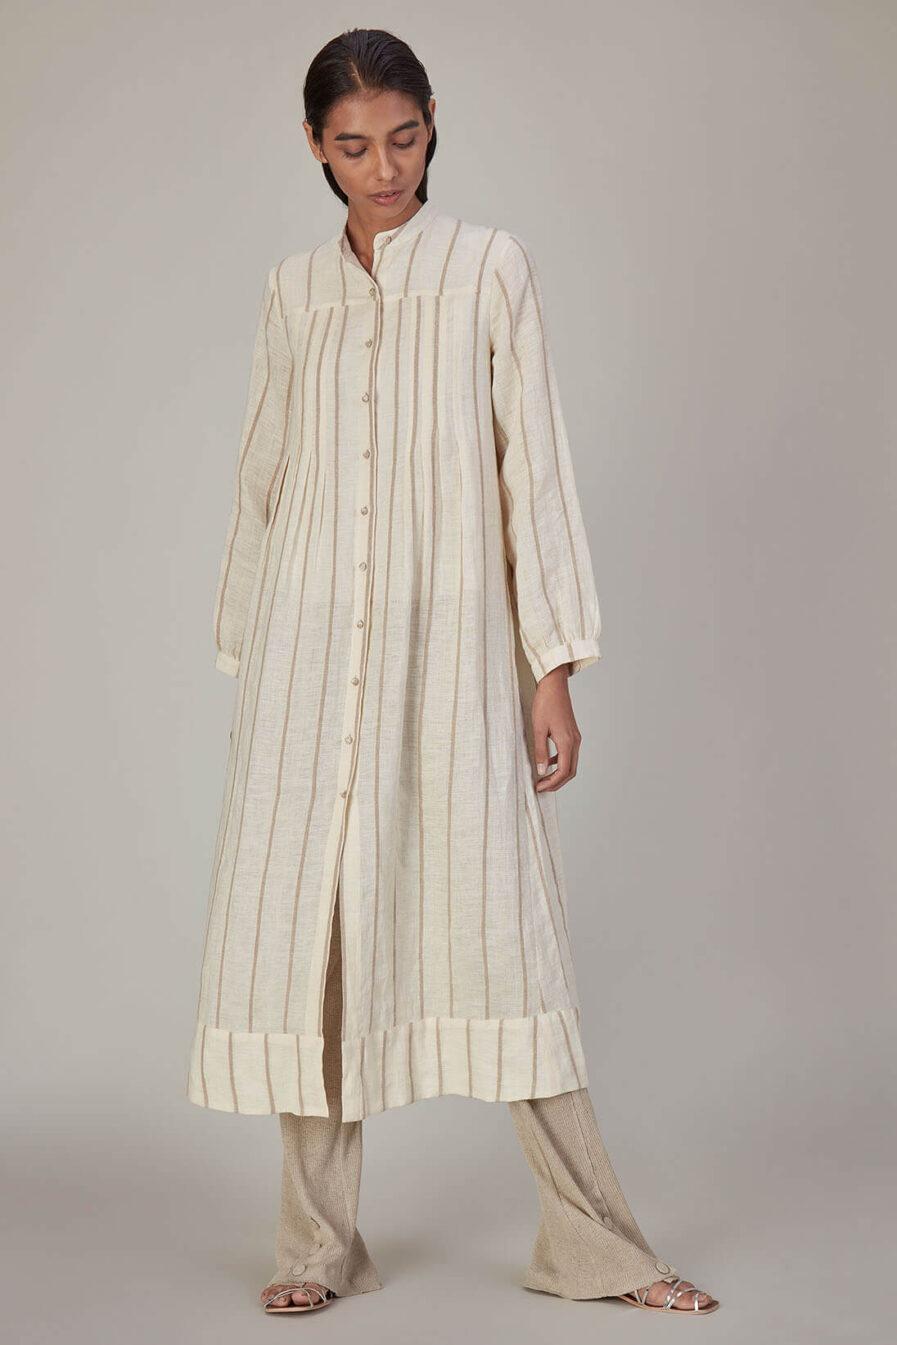 Anavila Corded Stripes Linen Dress